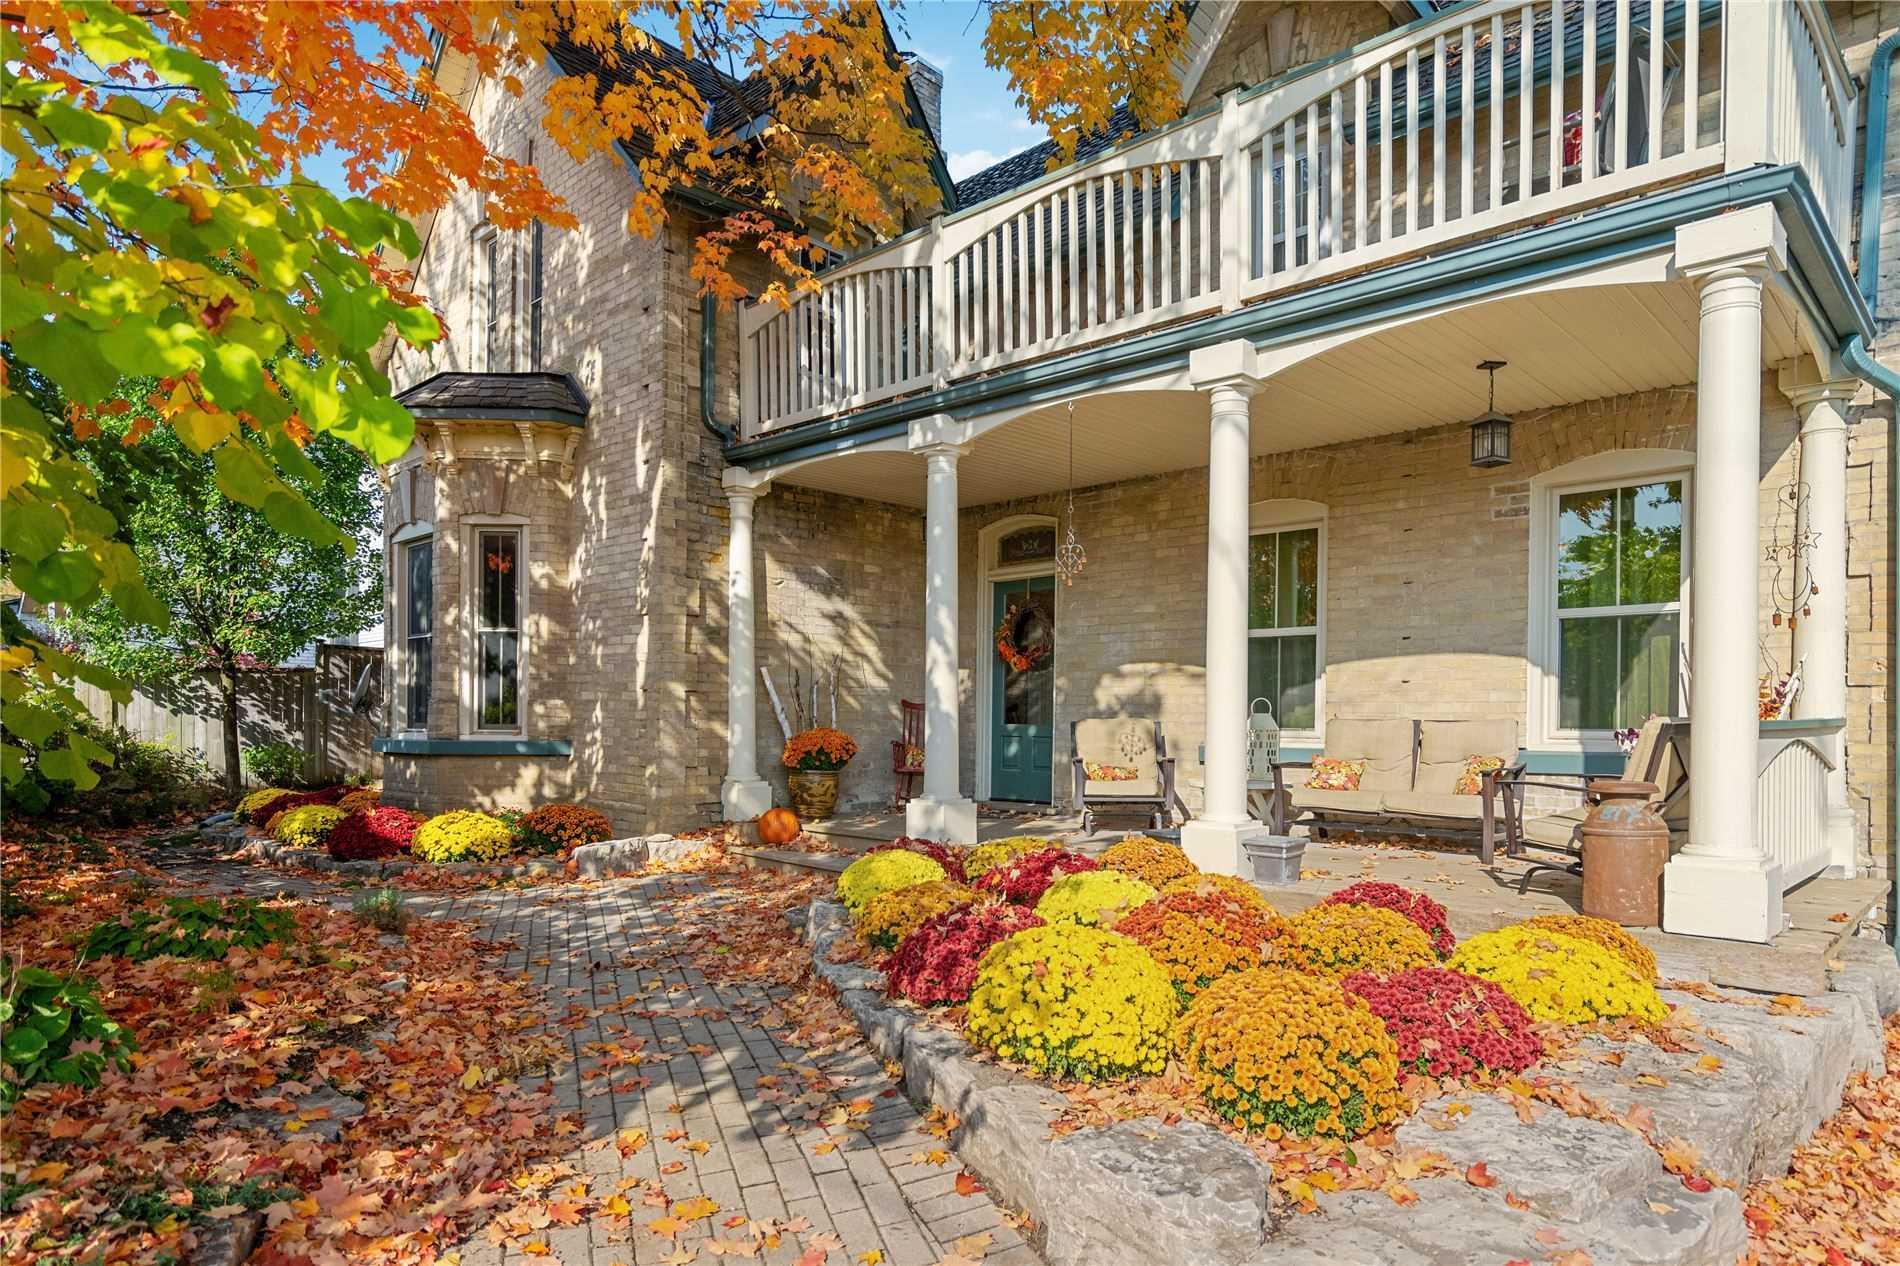 For Sale: 21 Maple Street, Uxbridge, ON   4 Bed, 3 Bath House for $1250000.00. See 19 photos!